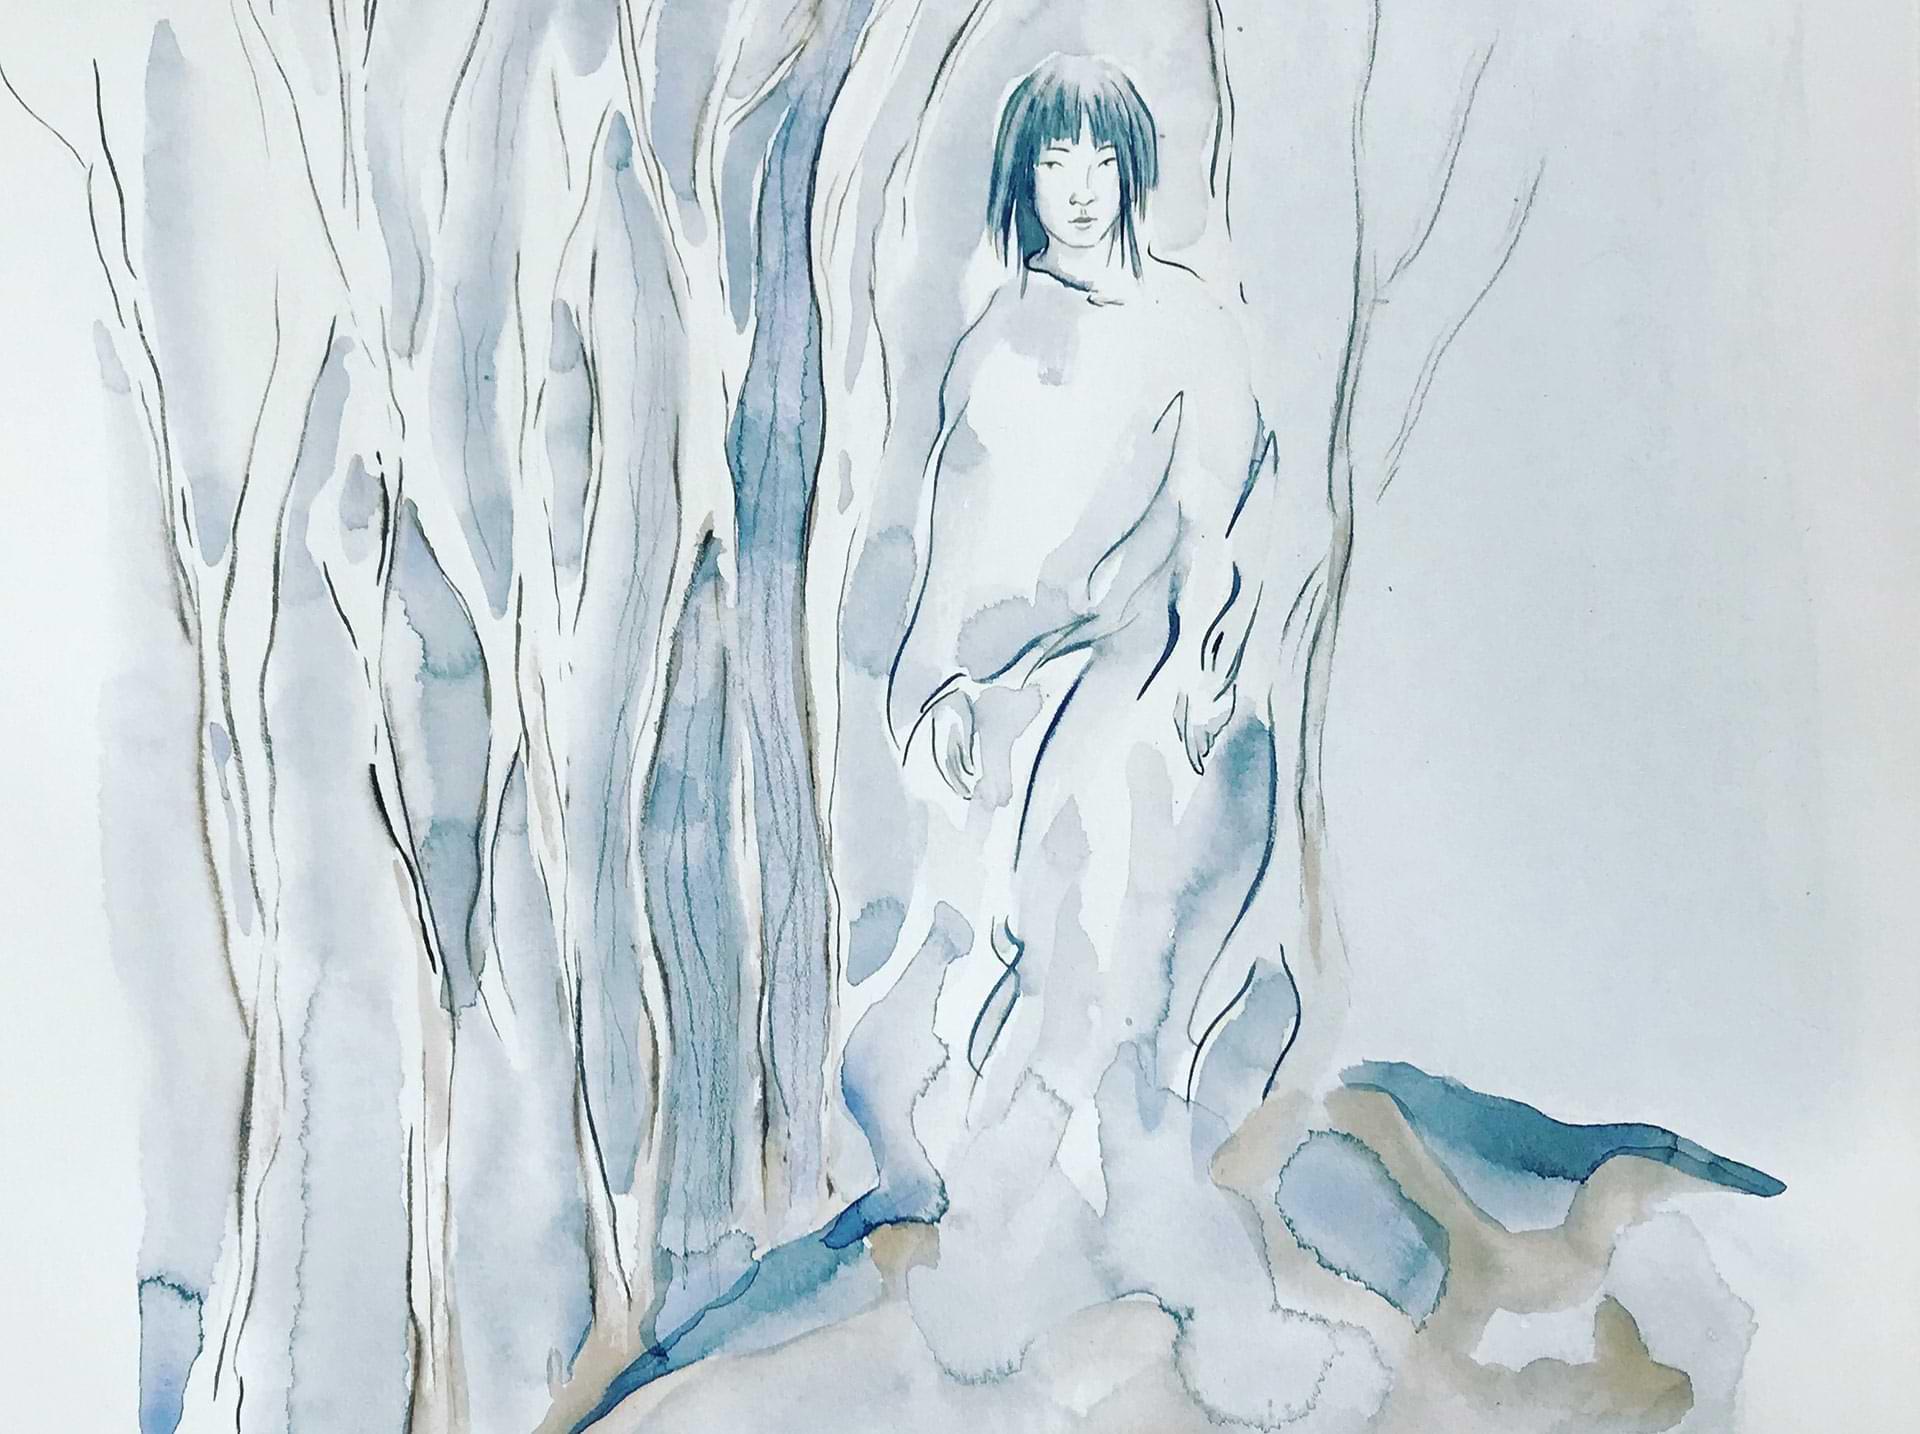 christianehaag-theboywholefthome-kunst-art-drawing-painting-aquarell-zeichnung-japan-harukimurakami